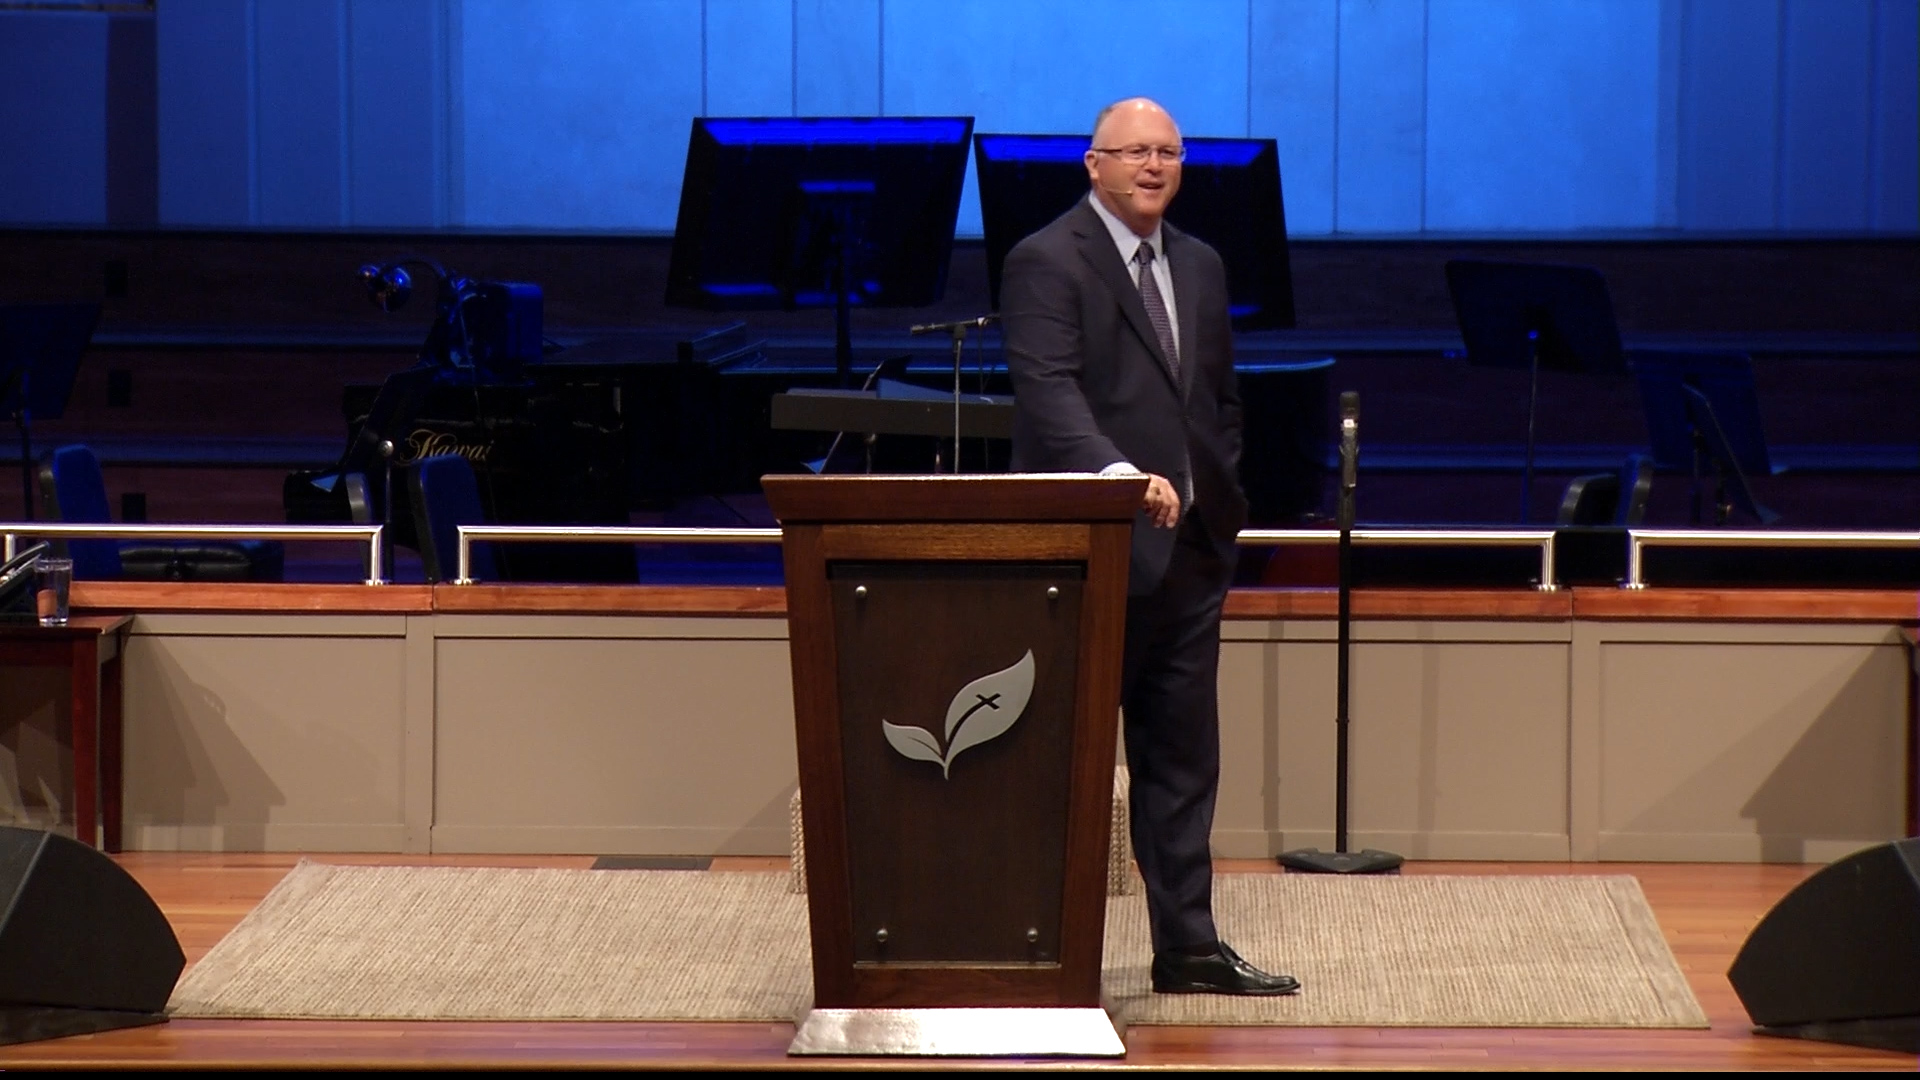 Pastor Paul Chappell: Lancaster Baptist Church Core Values